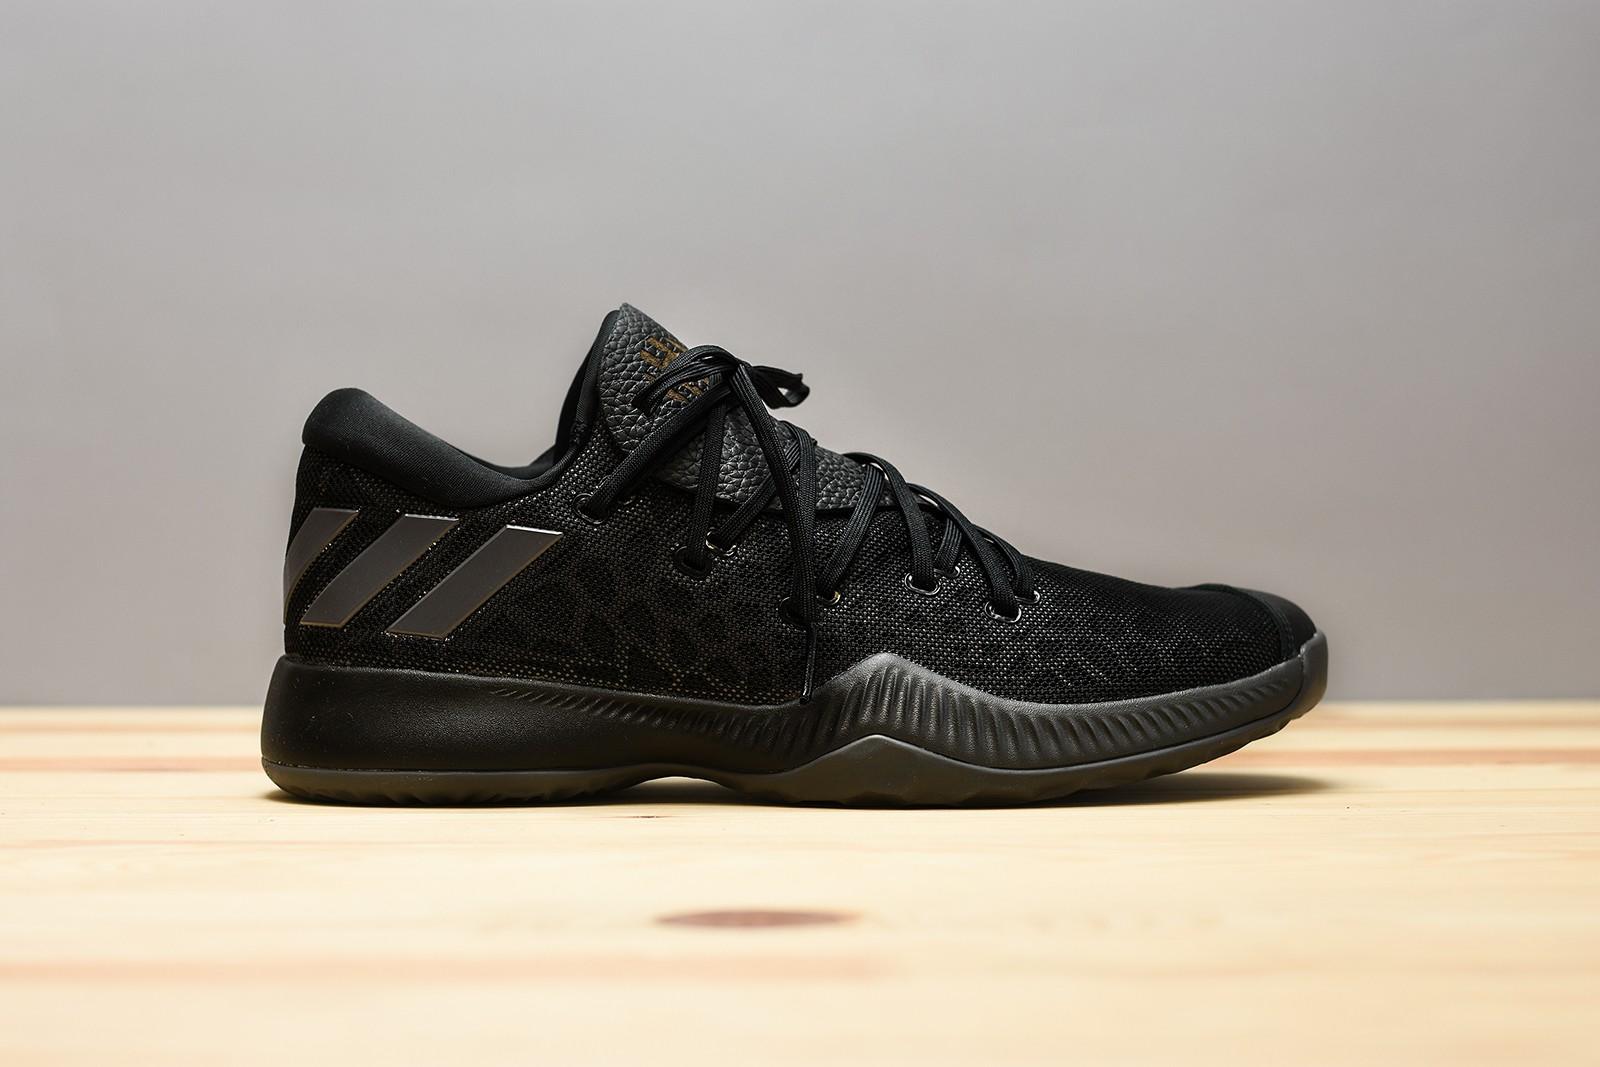 95cf1c2e2a4 Pánské Basketbalové boty adidas Performance Harden B E